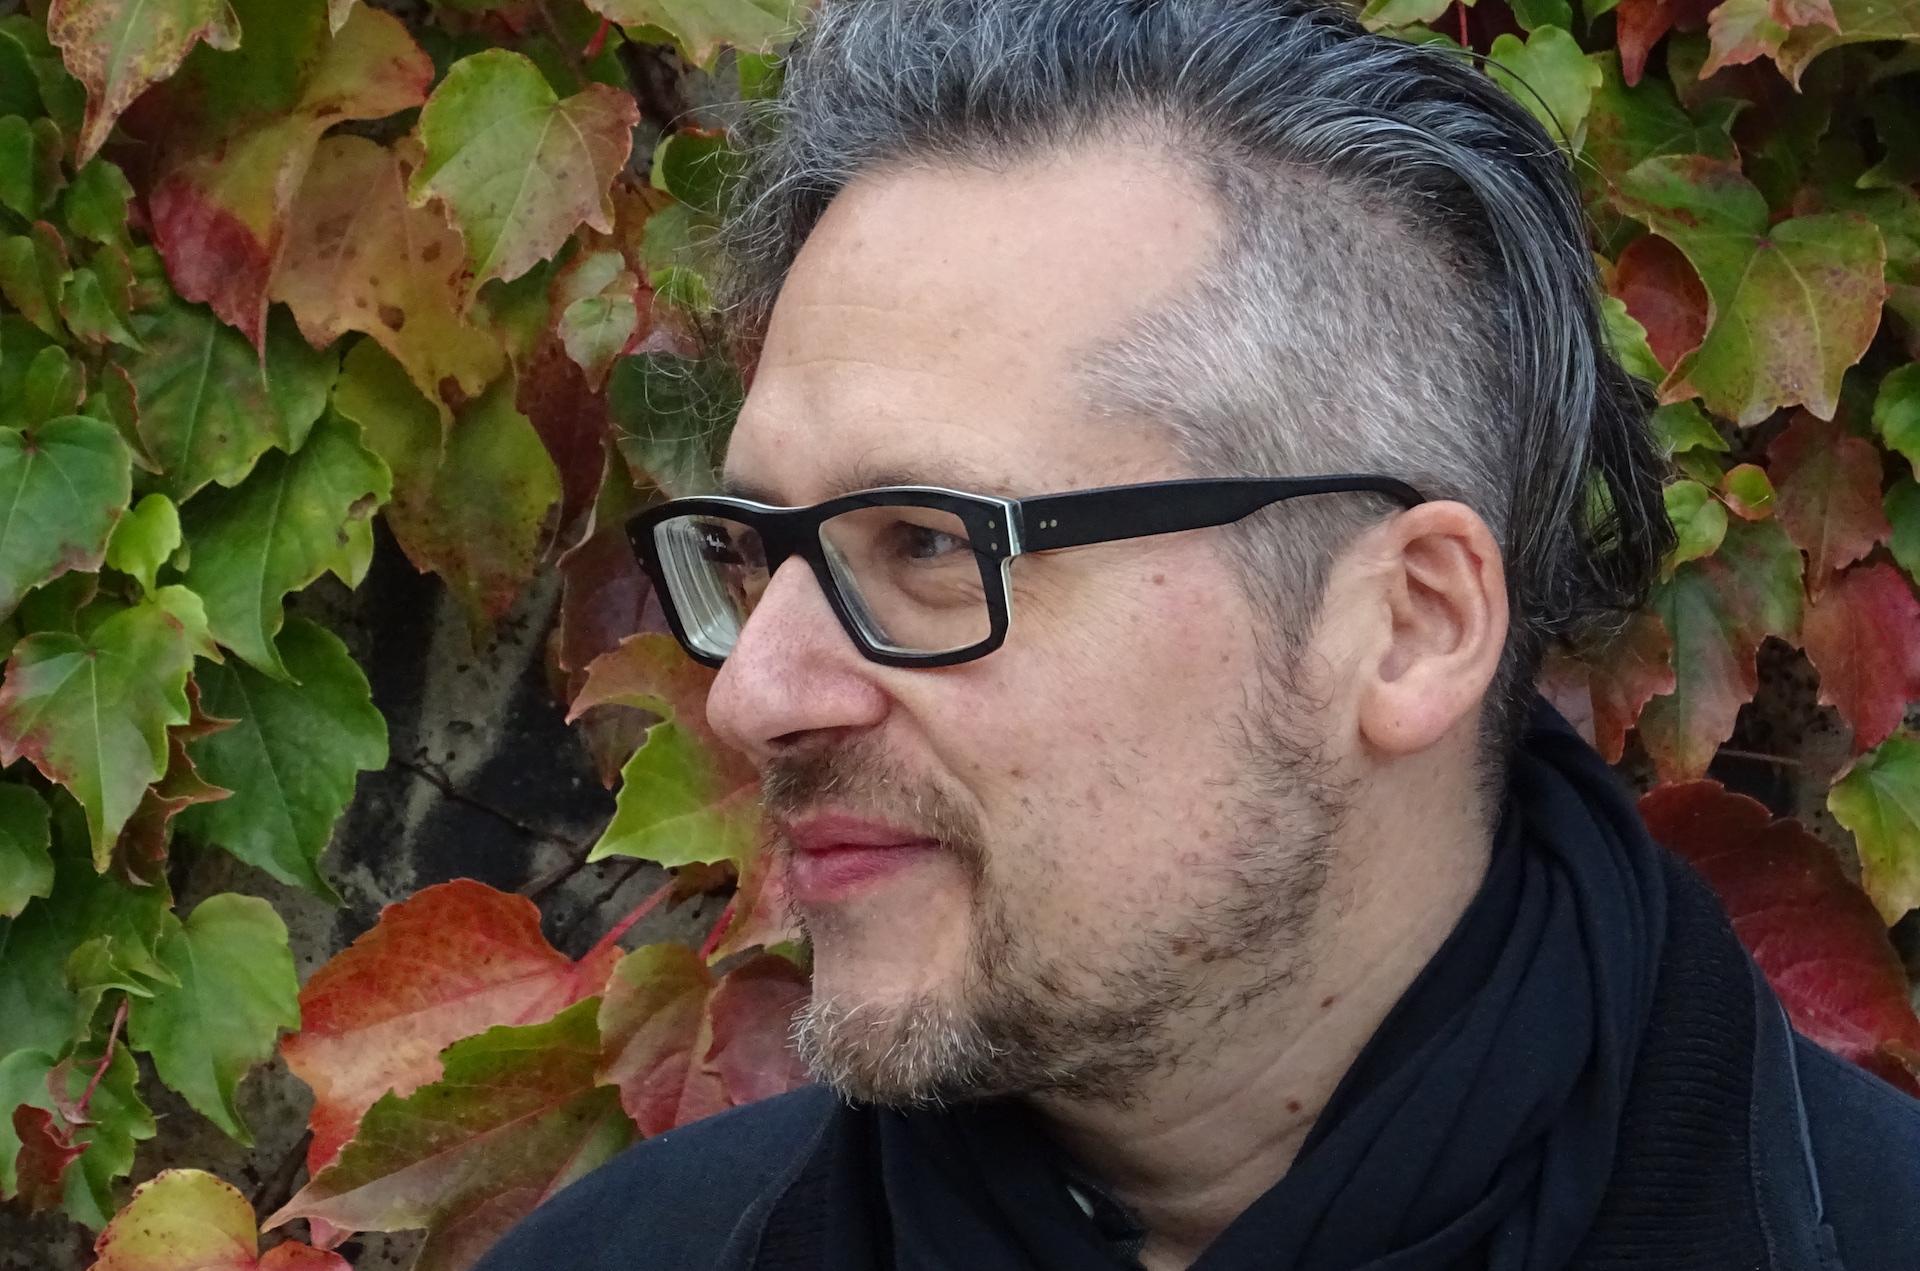 Falk Schreiber